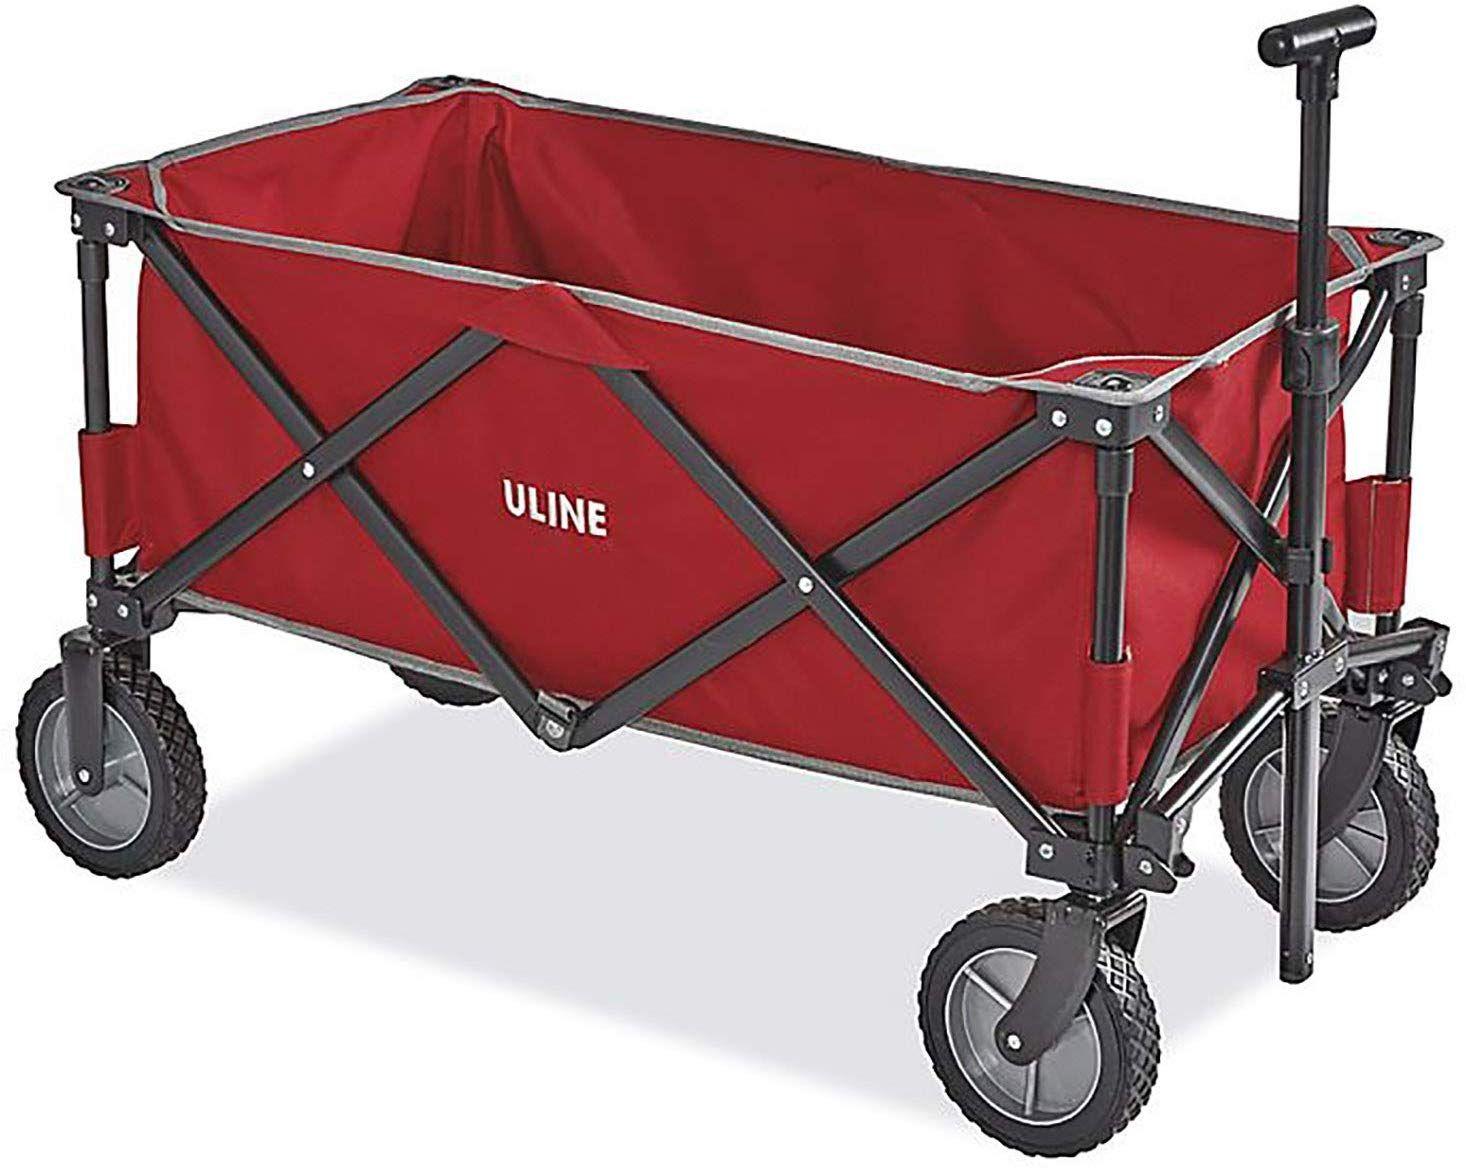 ULINE Utility Wagon, Red Utility wagon, Wagon, Camping